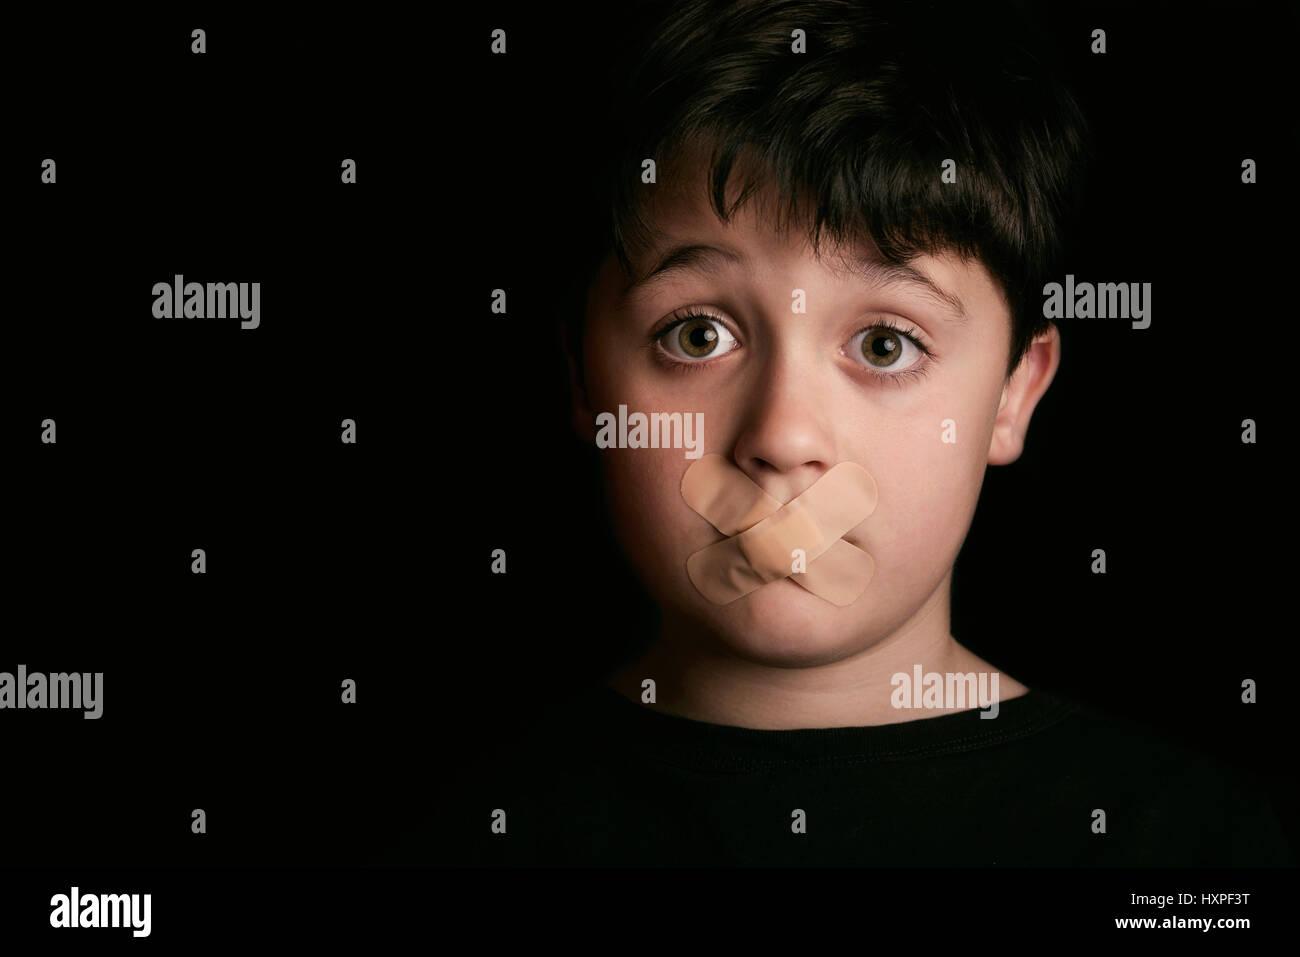 Sad child with Sealed Mouth - Stock Image